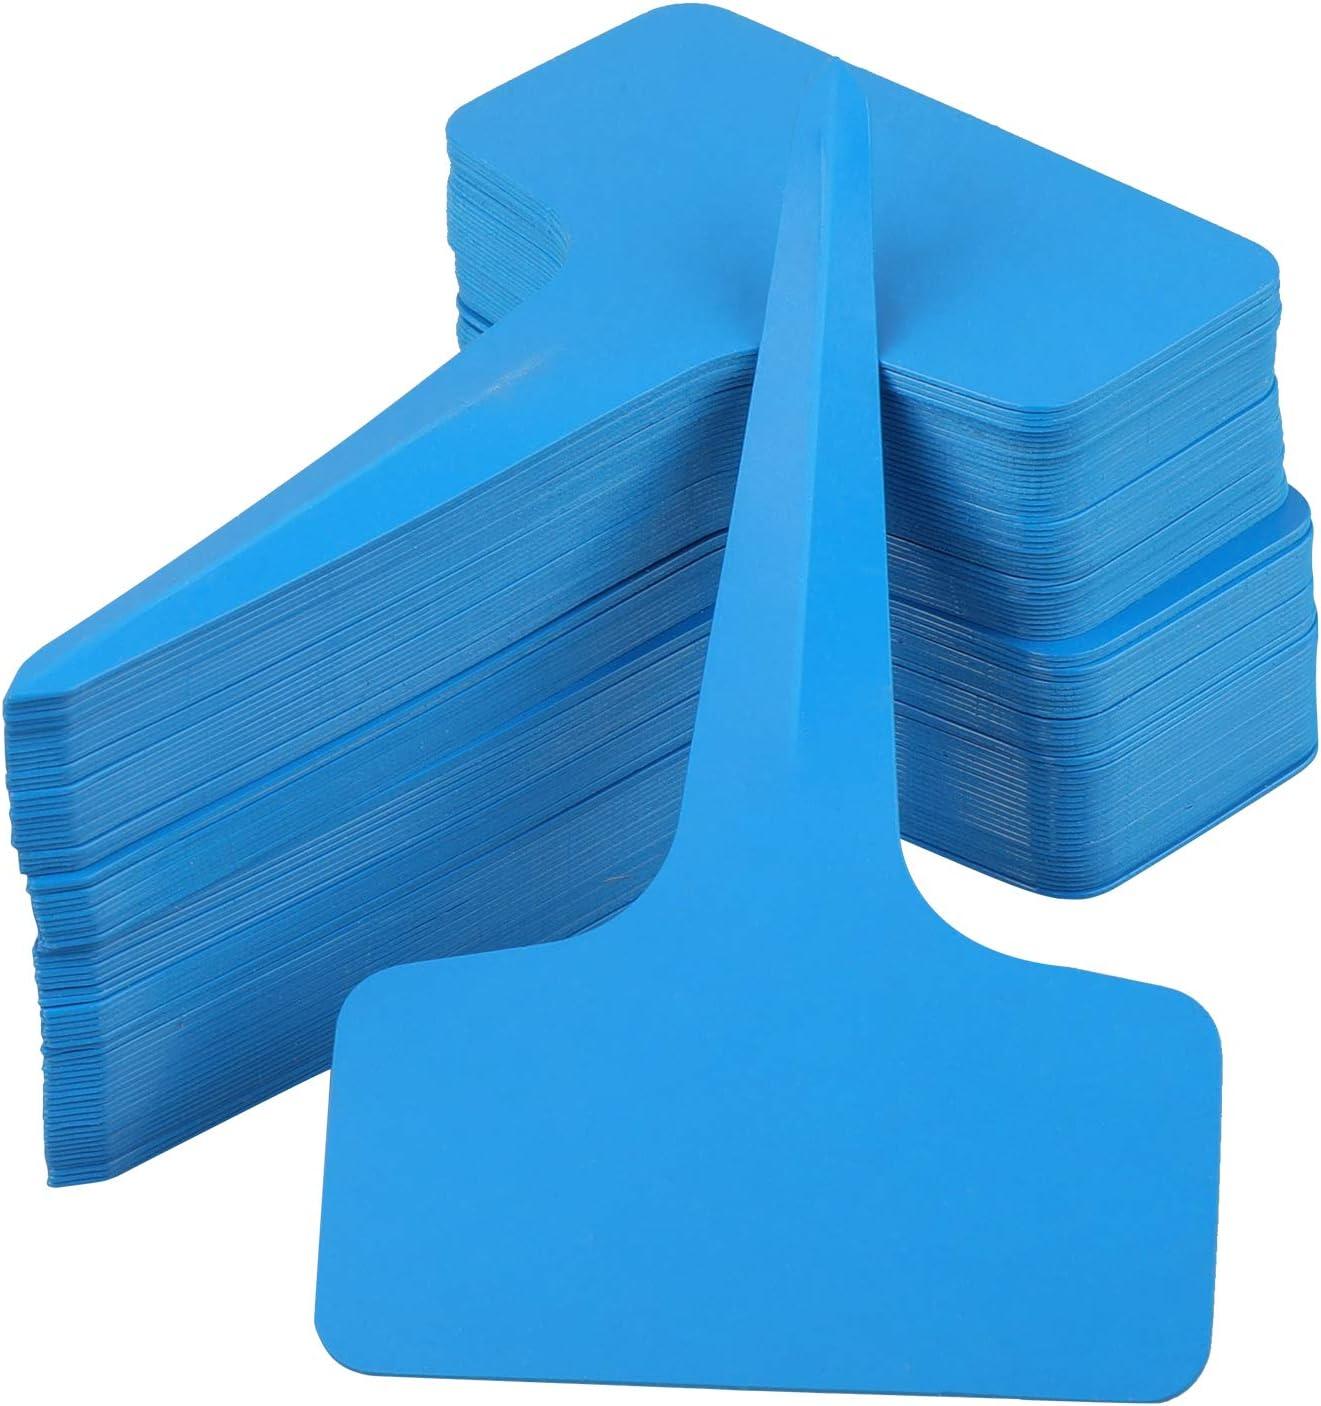 Blue KINGLAKE 100PCS Plastic Plant Markers Labels Blue Garden Tags for Vegetables Herb 6x10cm